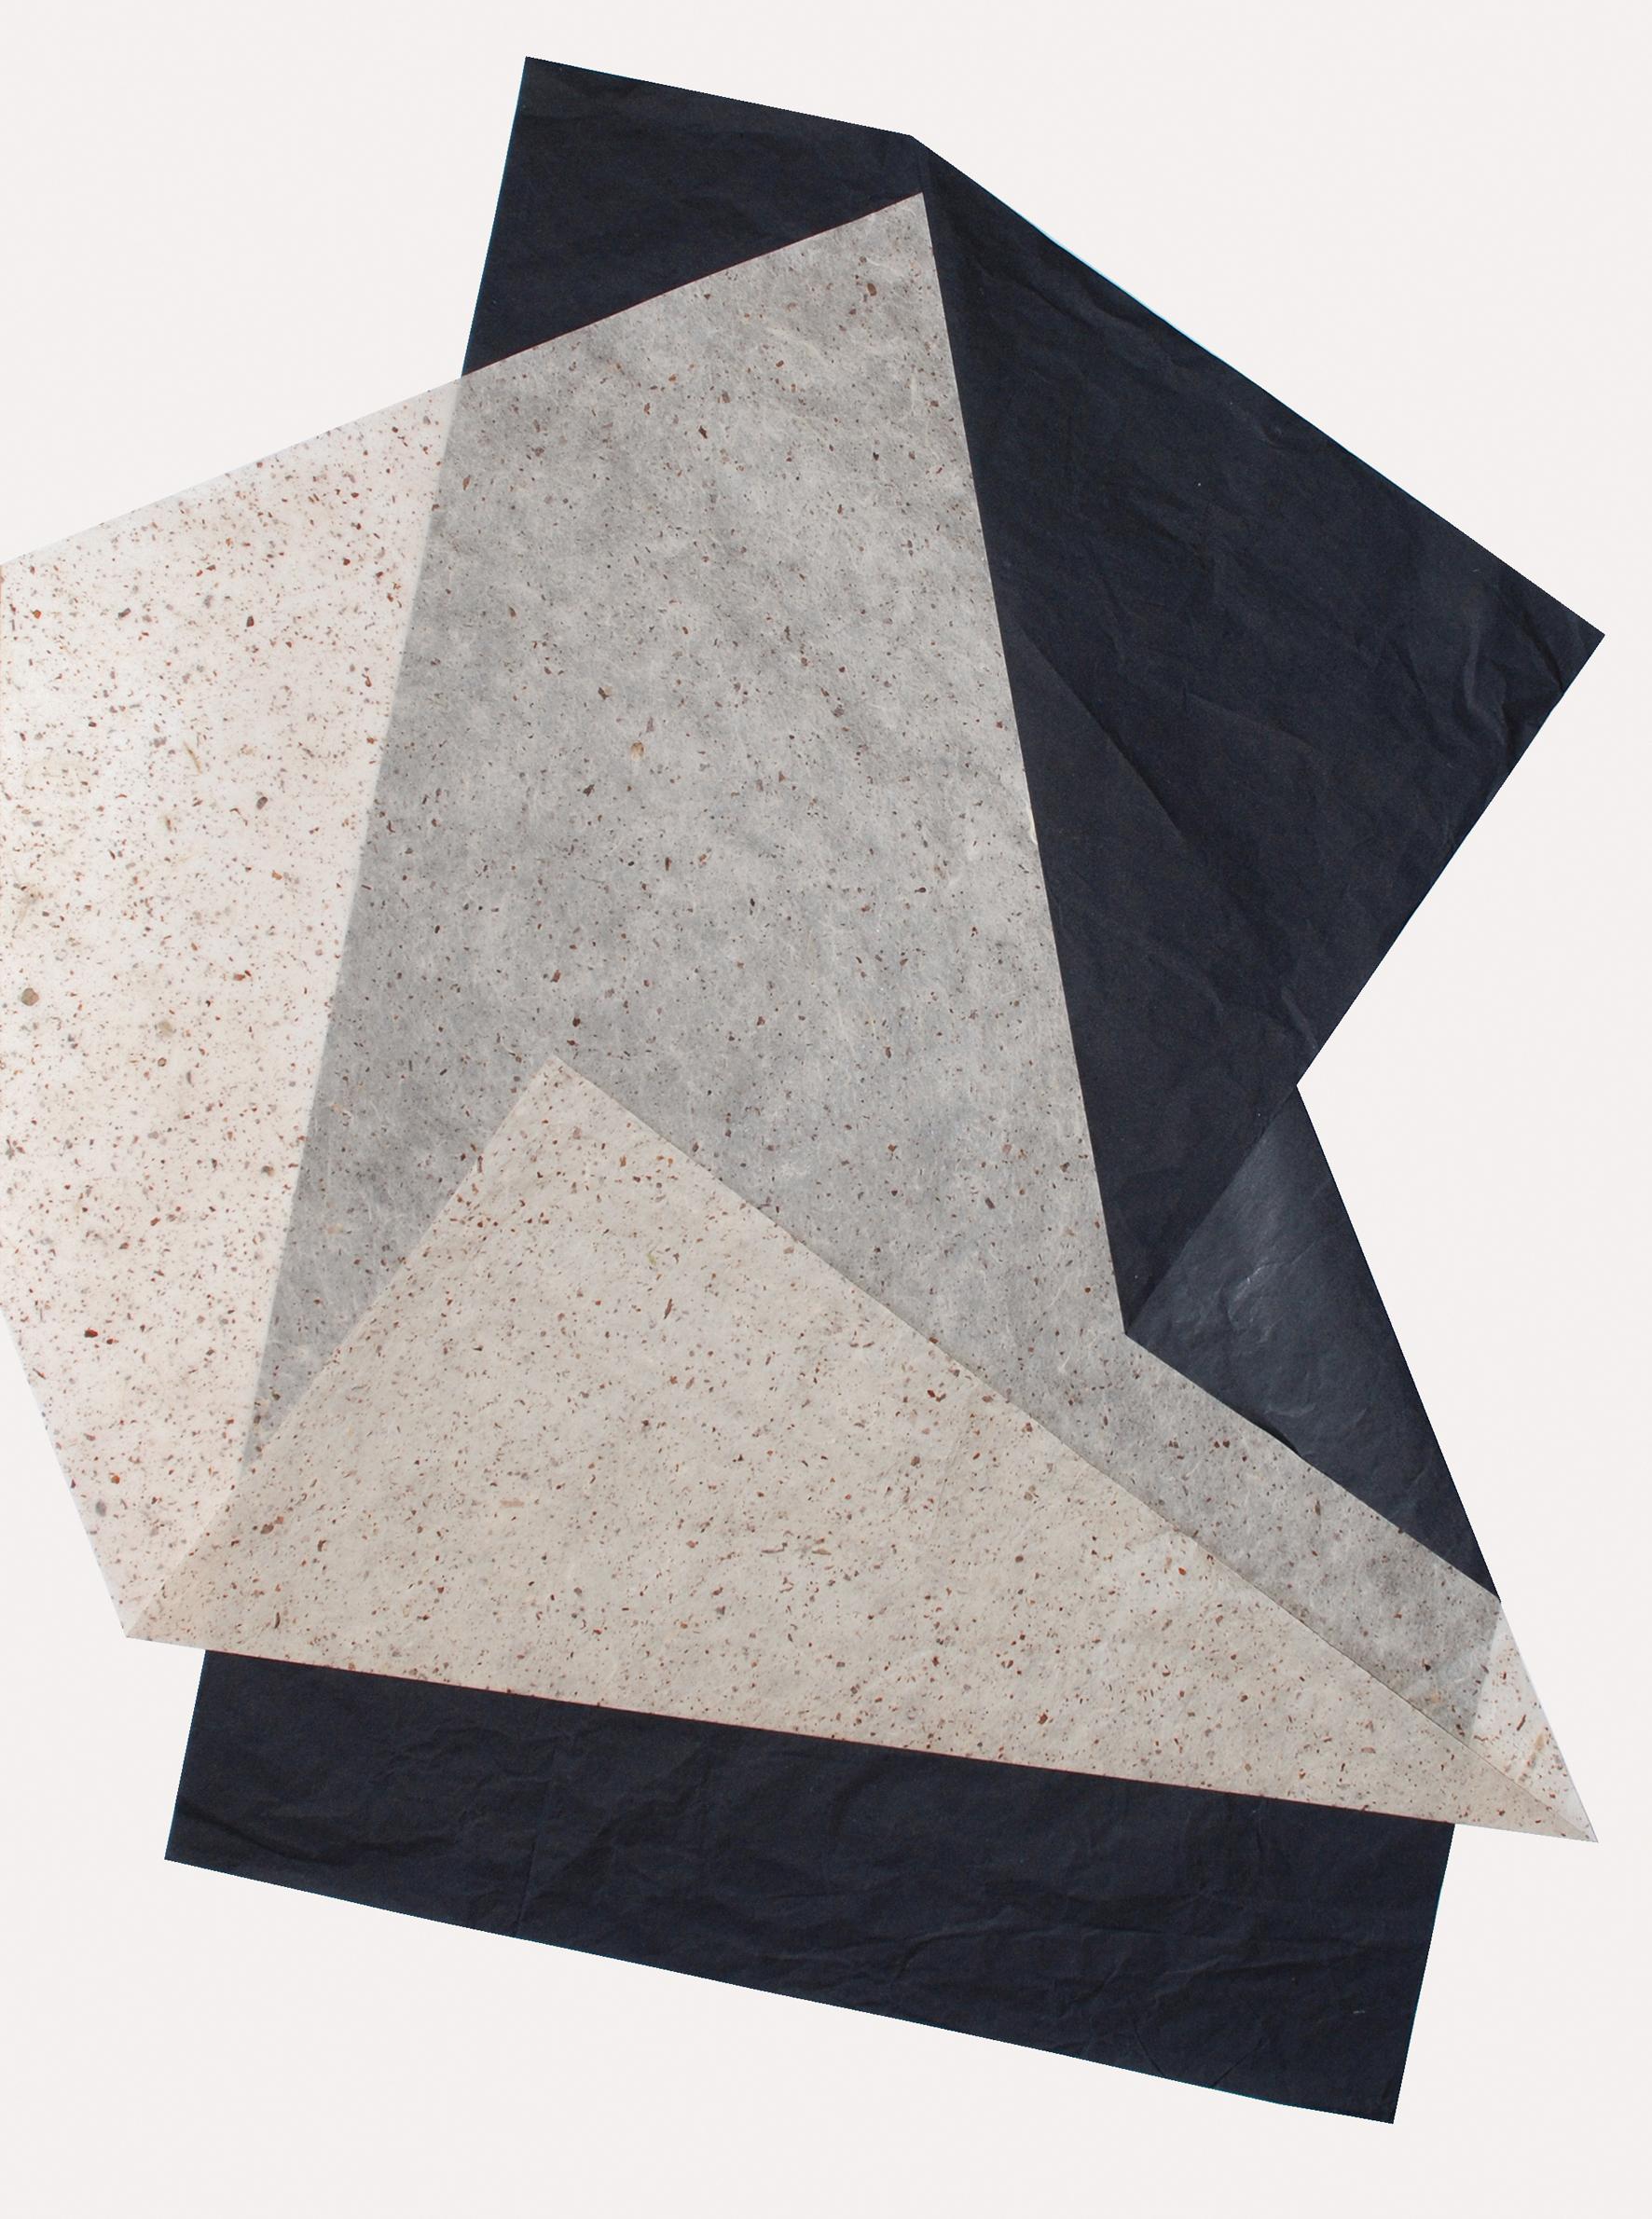 11. motiv, 80 x 60 cm, seidenpapiere gefaltet